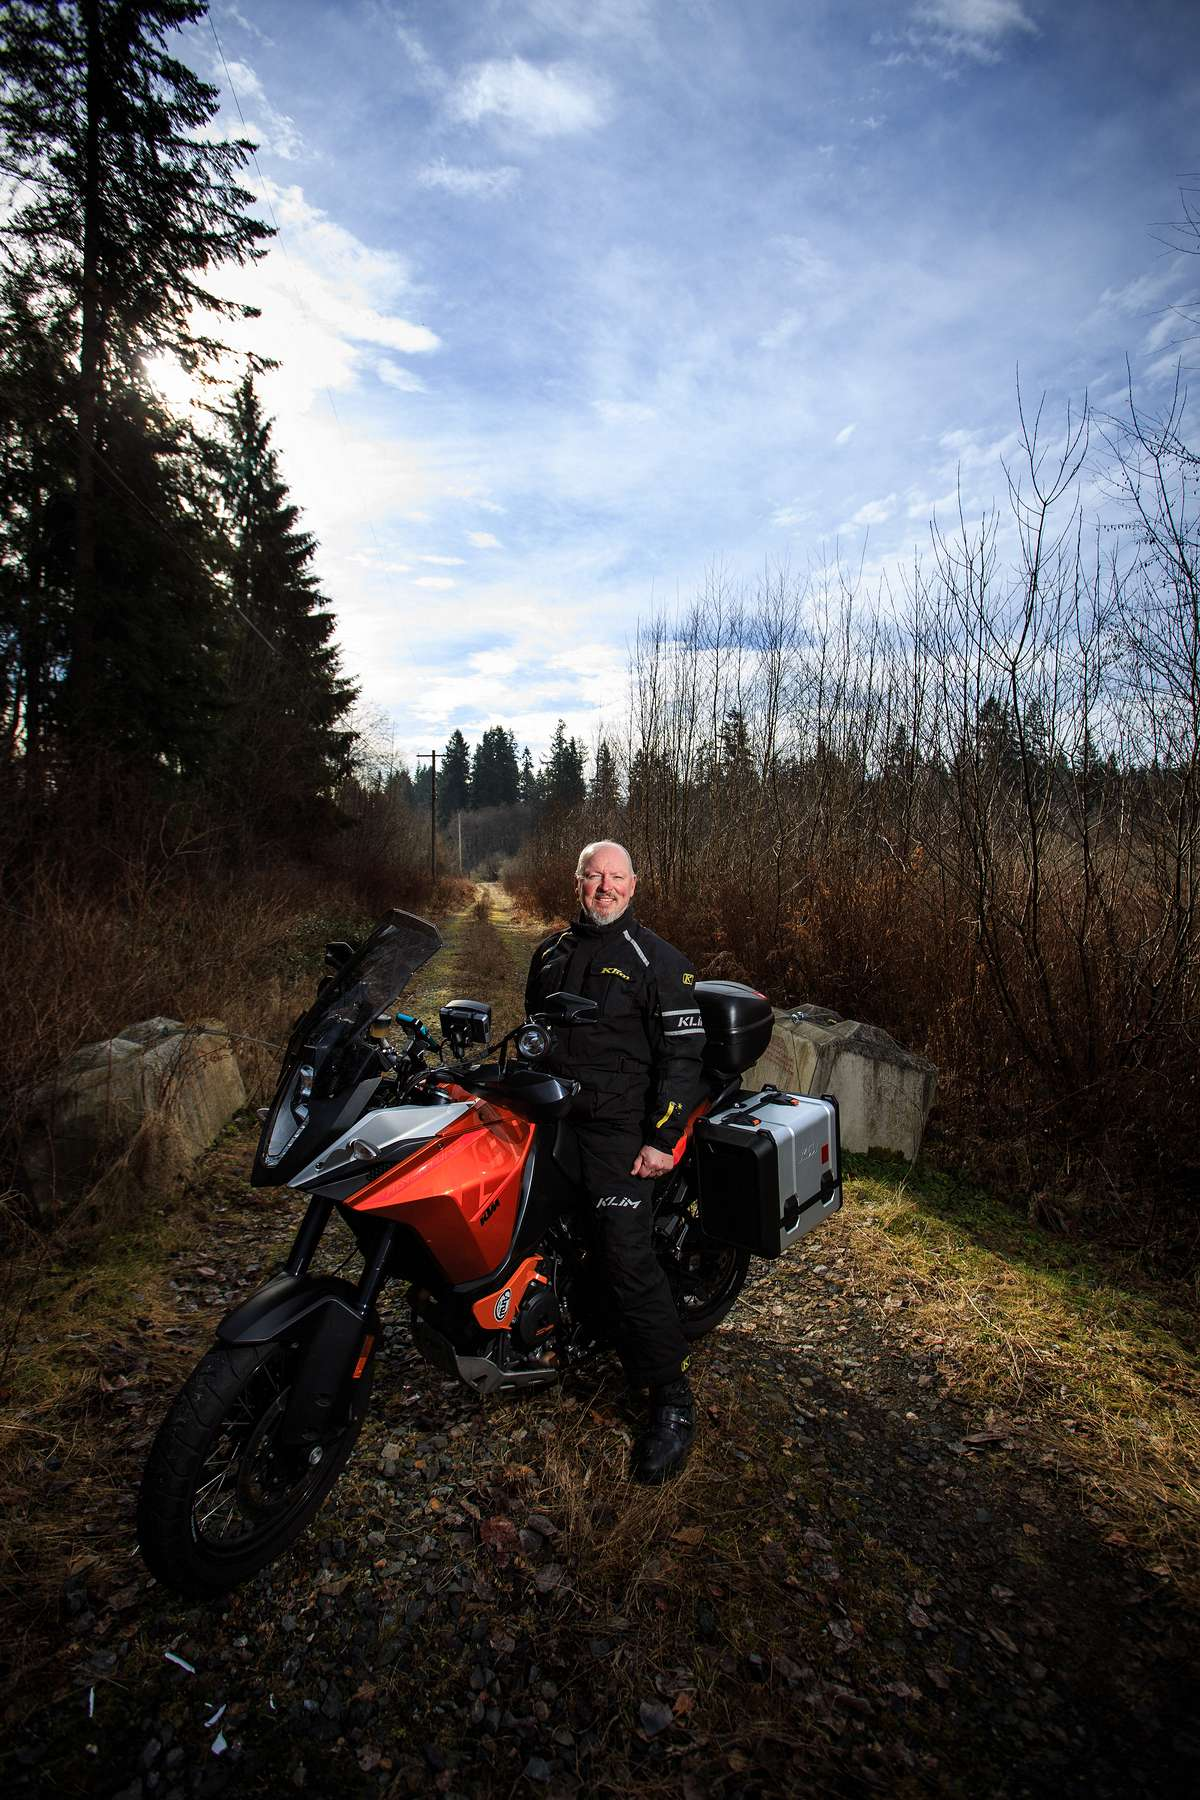 078-editorial-magazine-portraits-motorcyclist.jpg